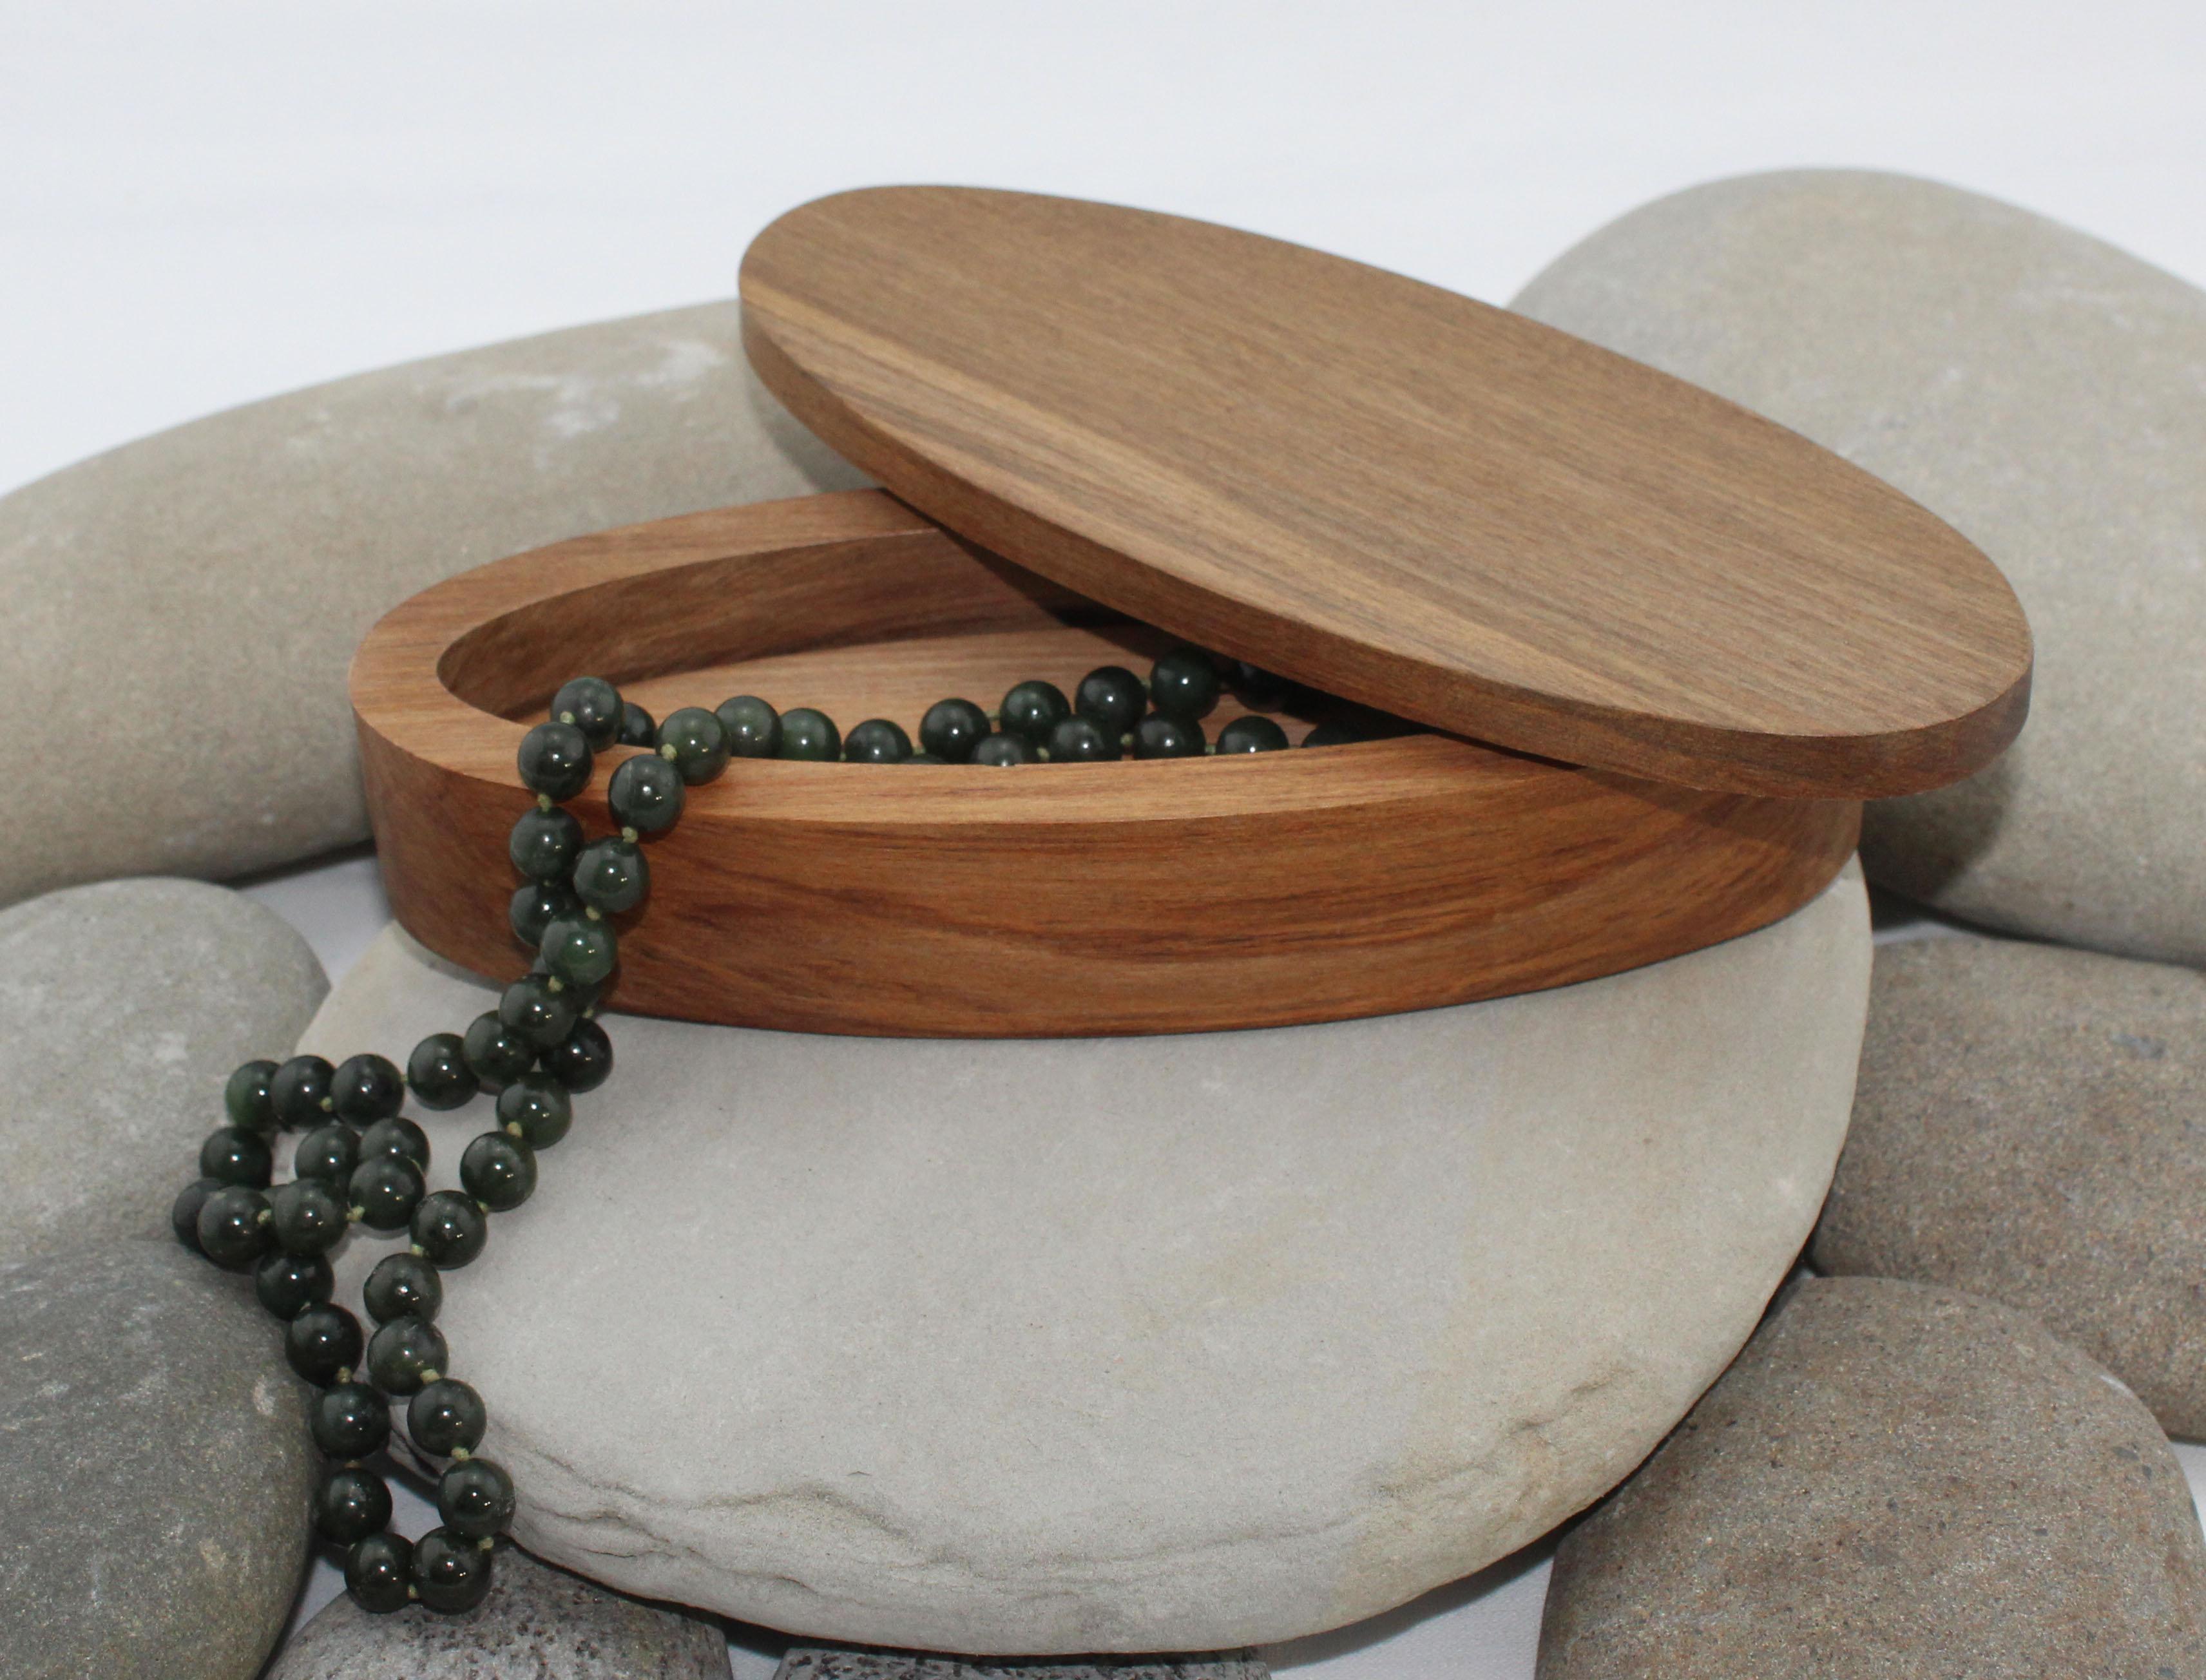 Nz Made Rimu River Wood Elliptical Pendant Box Small Flat Lid